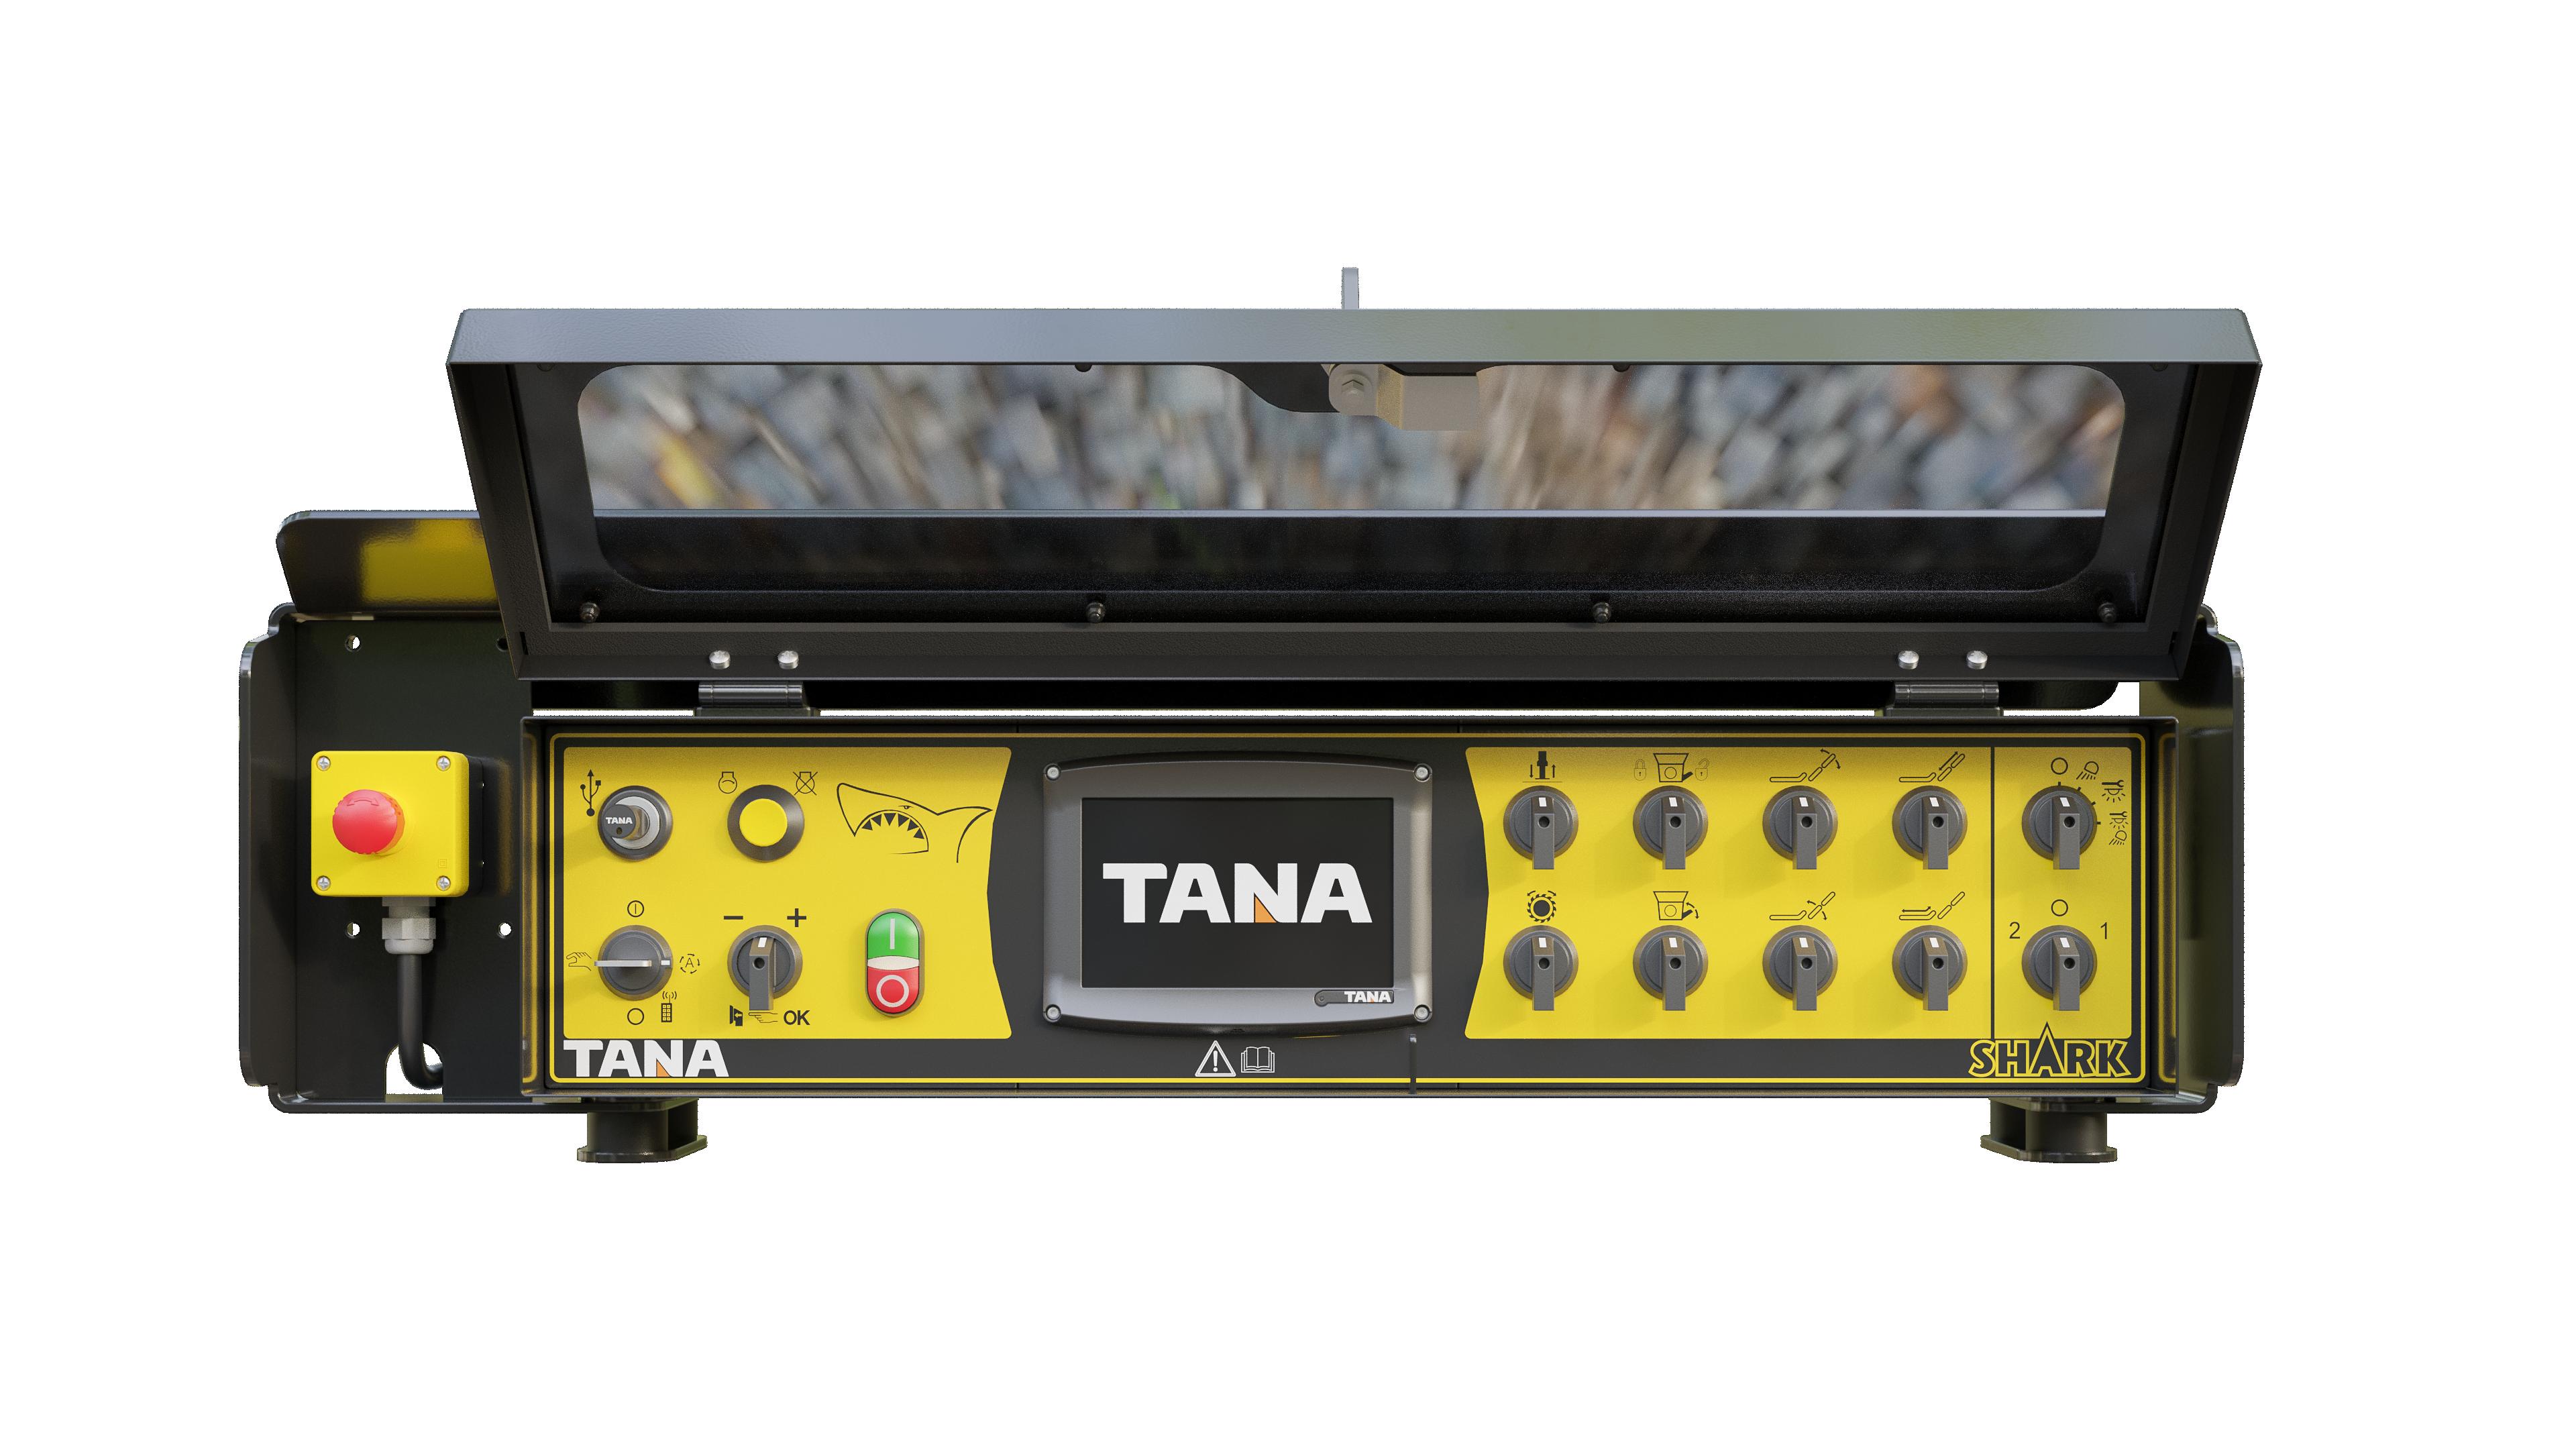 TANA Control System